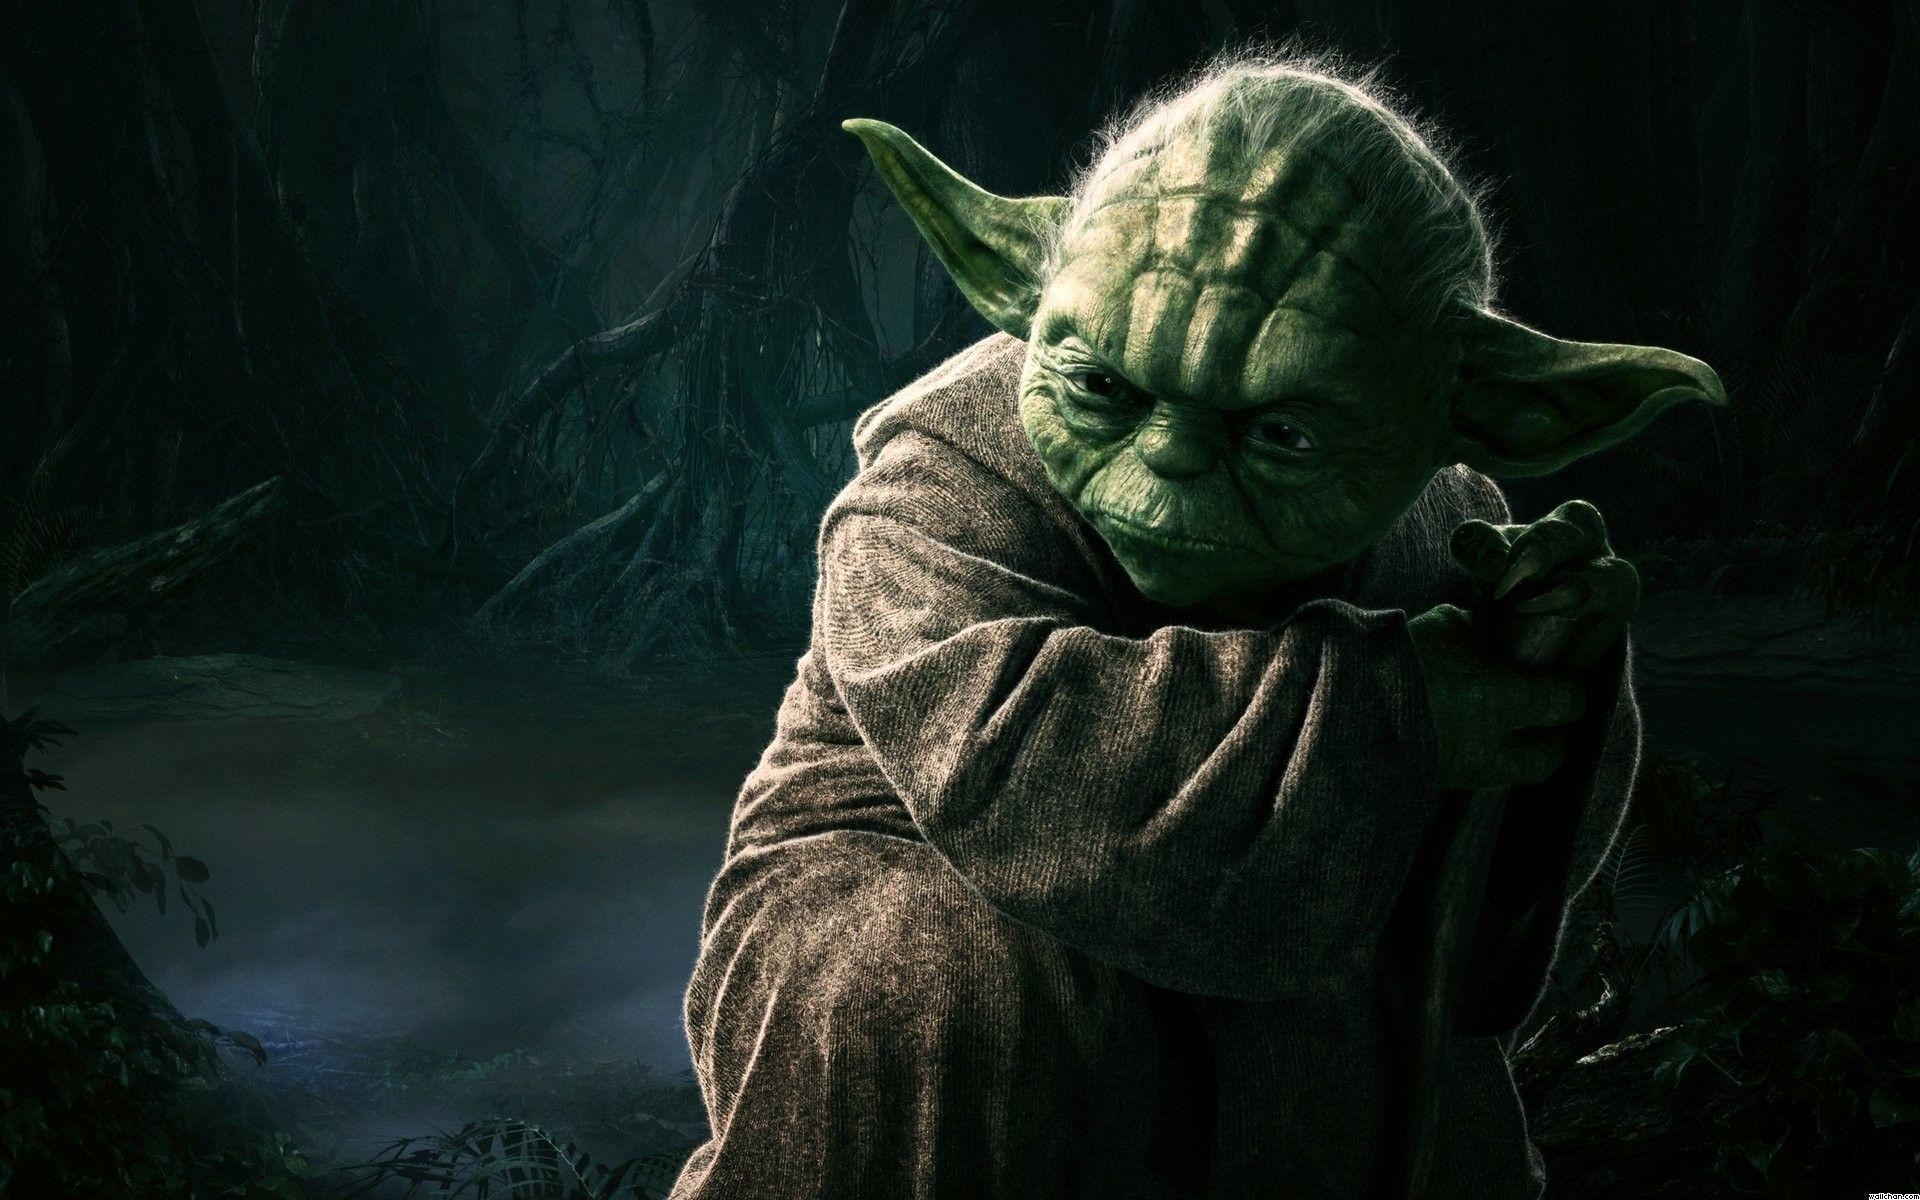 Master Yoda Wallpapers Top Free Master Yoda Backgrounds Wallpaperaccess